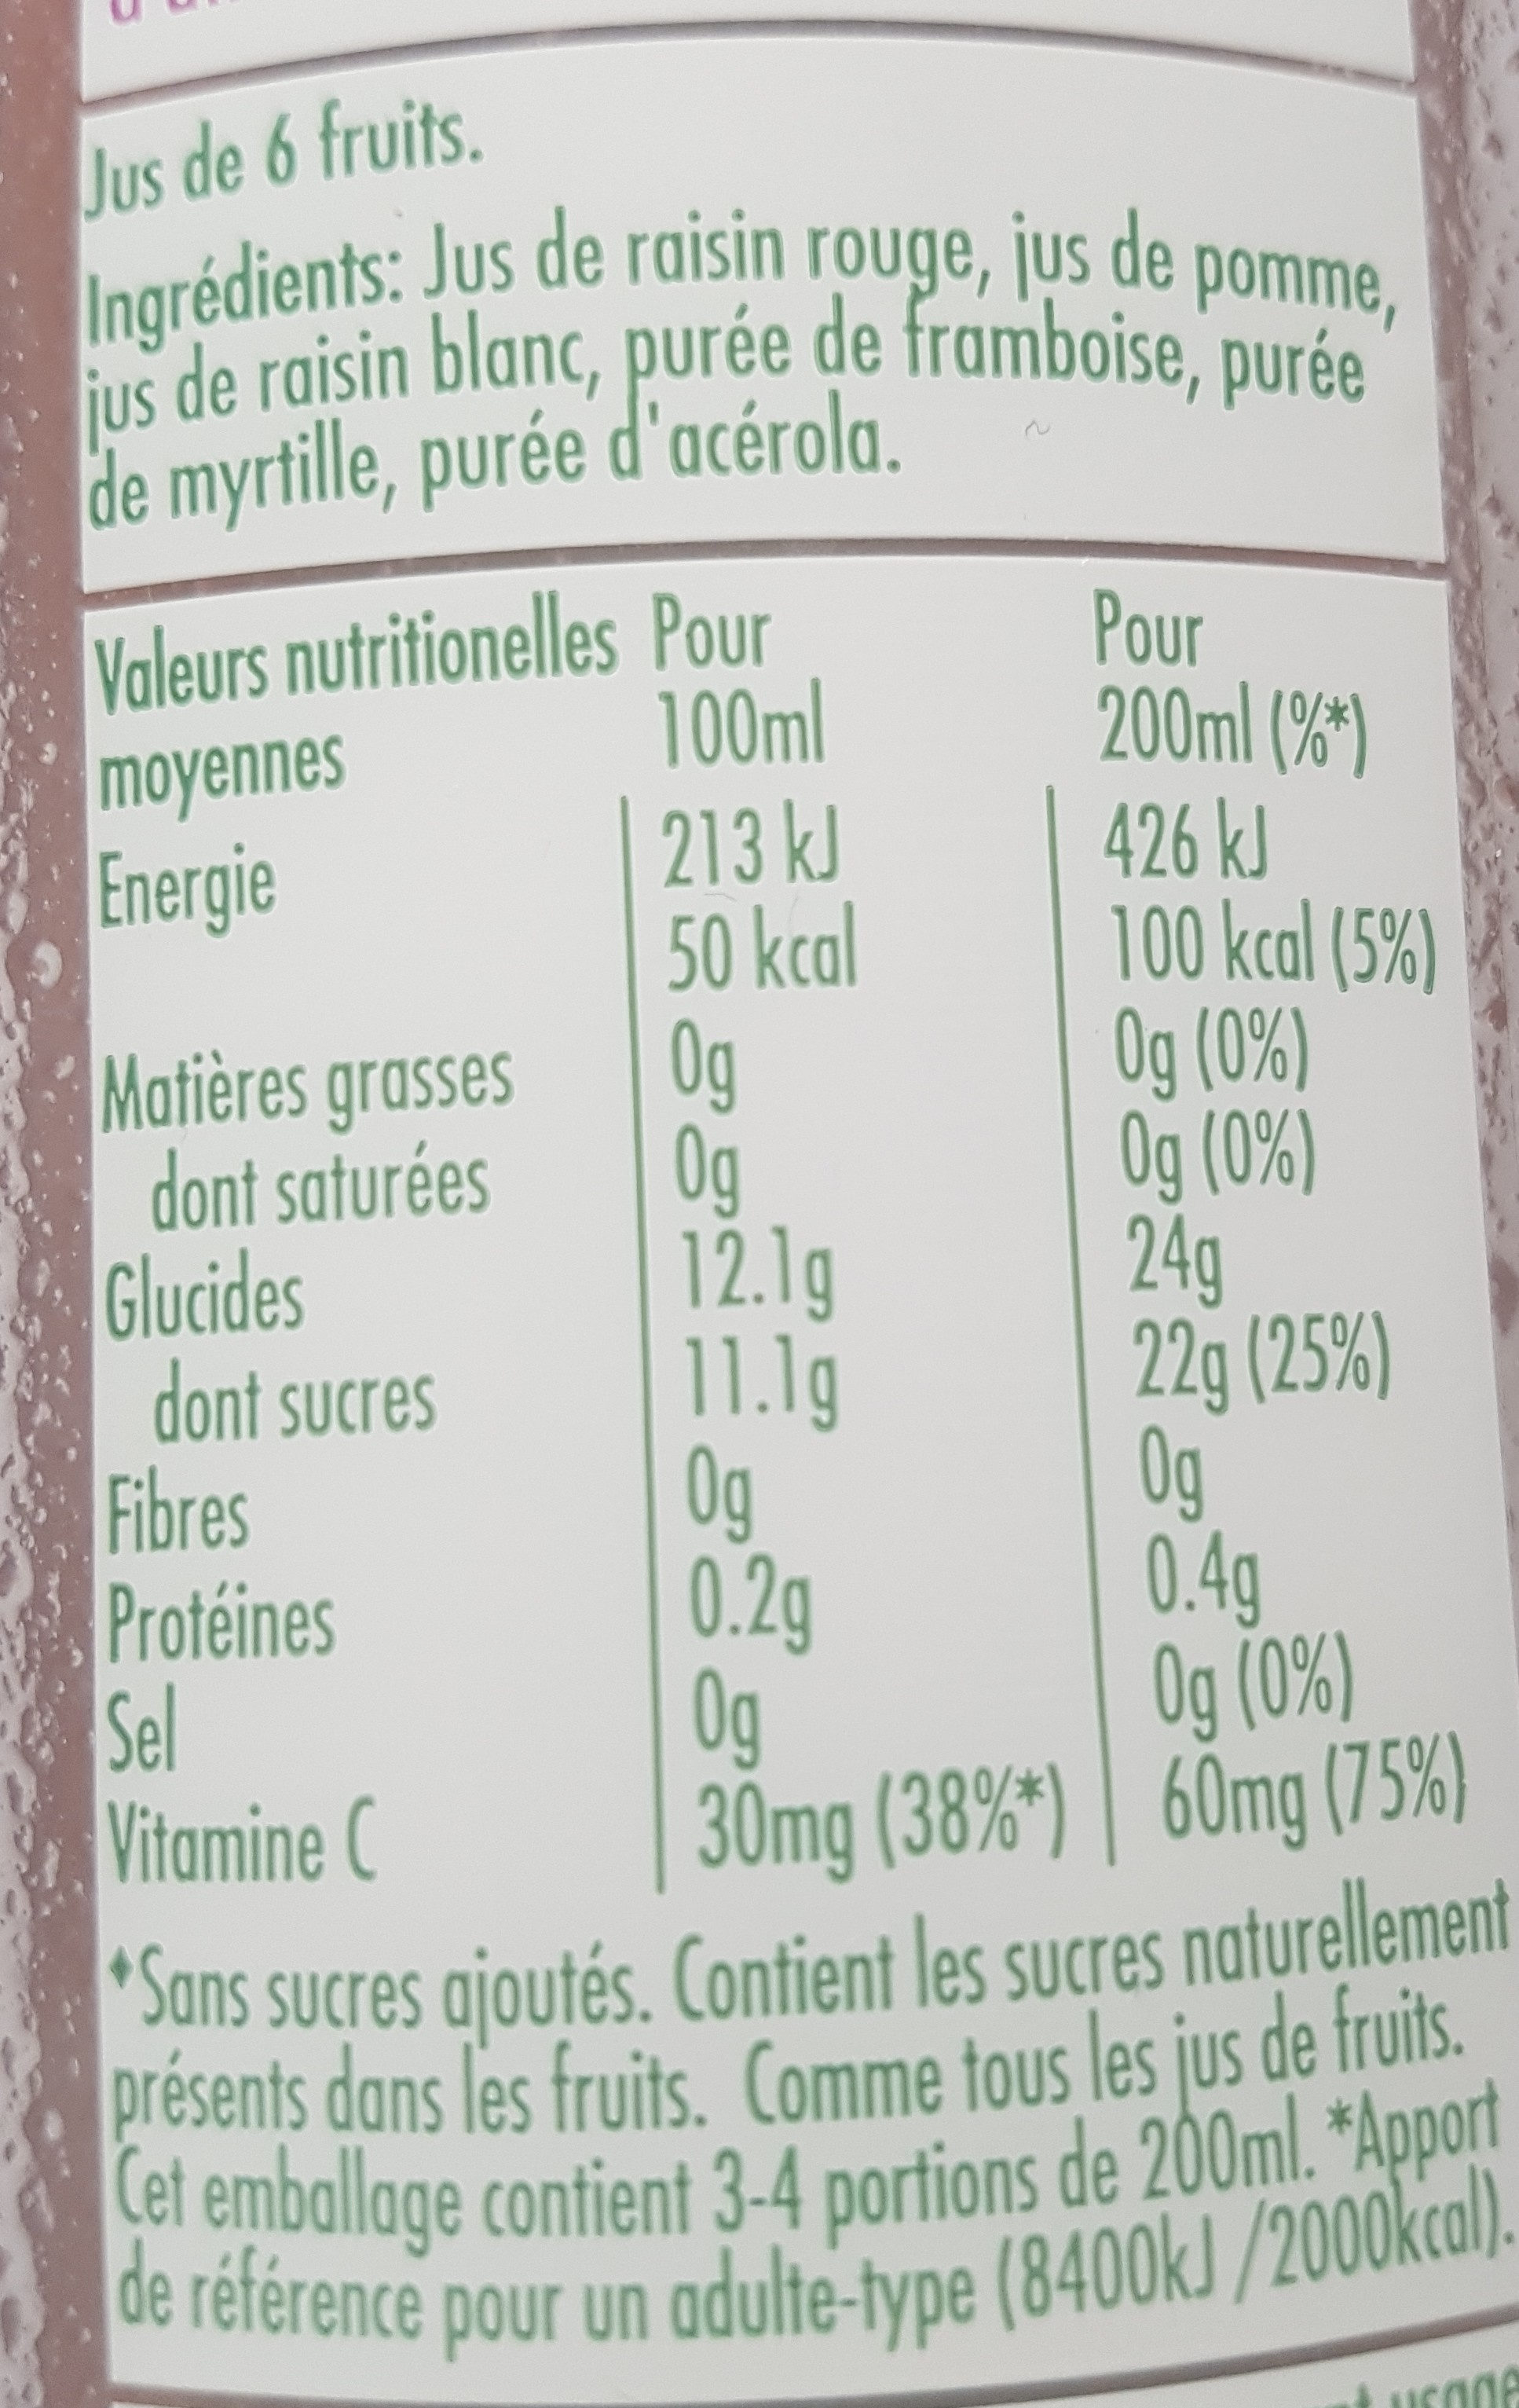 Tropicana essentiels antioxydant - Ingredients - fr